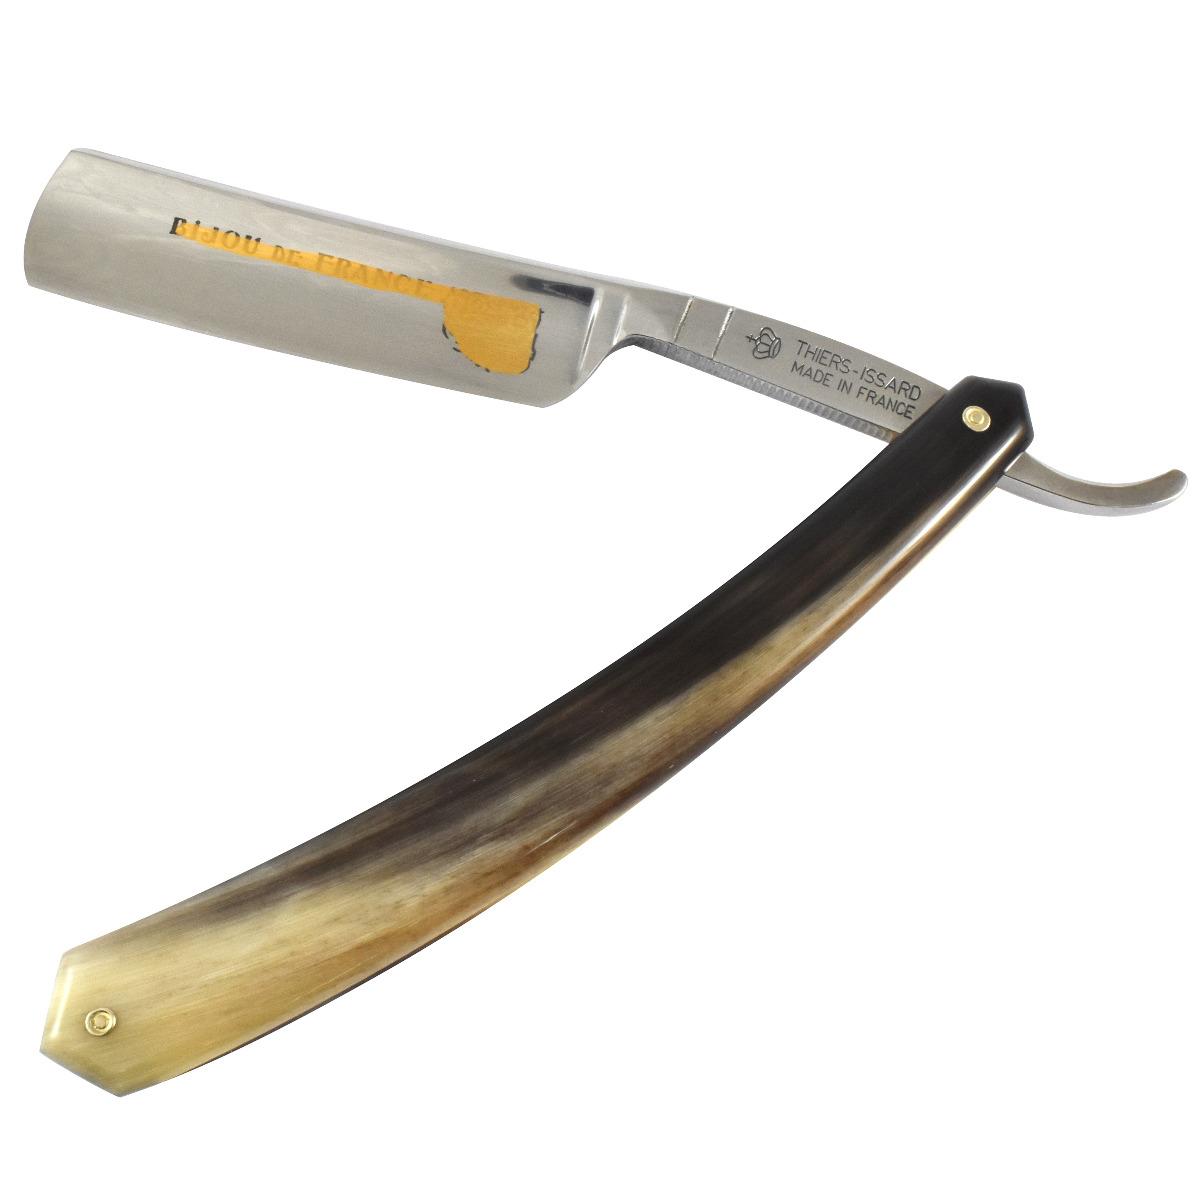 Thiers-Issard Blonde Bijou 5/8 Cut Throat in Real Horn